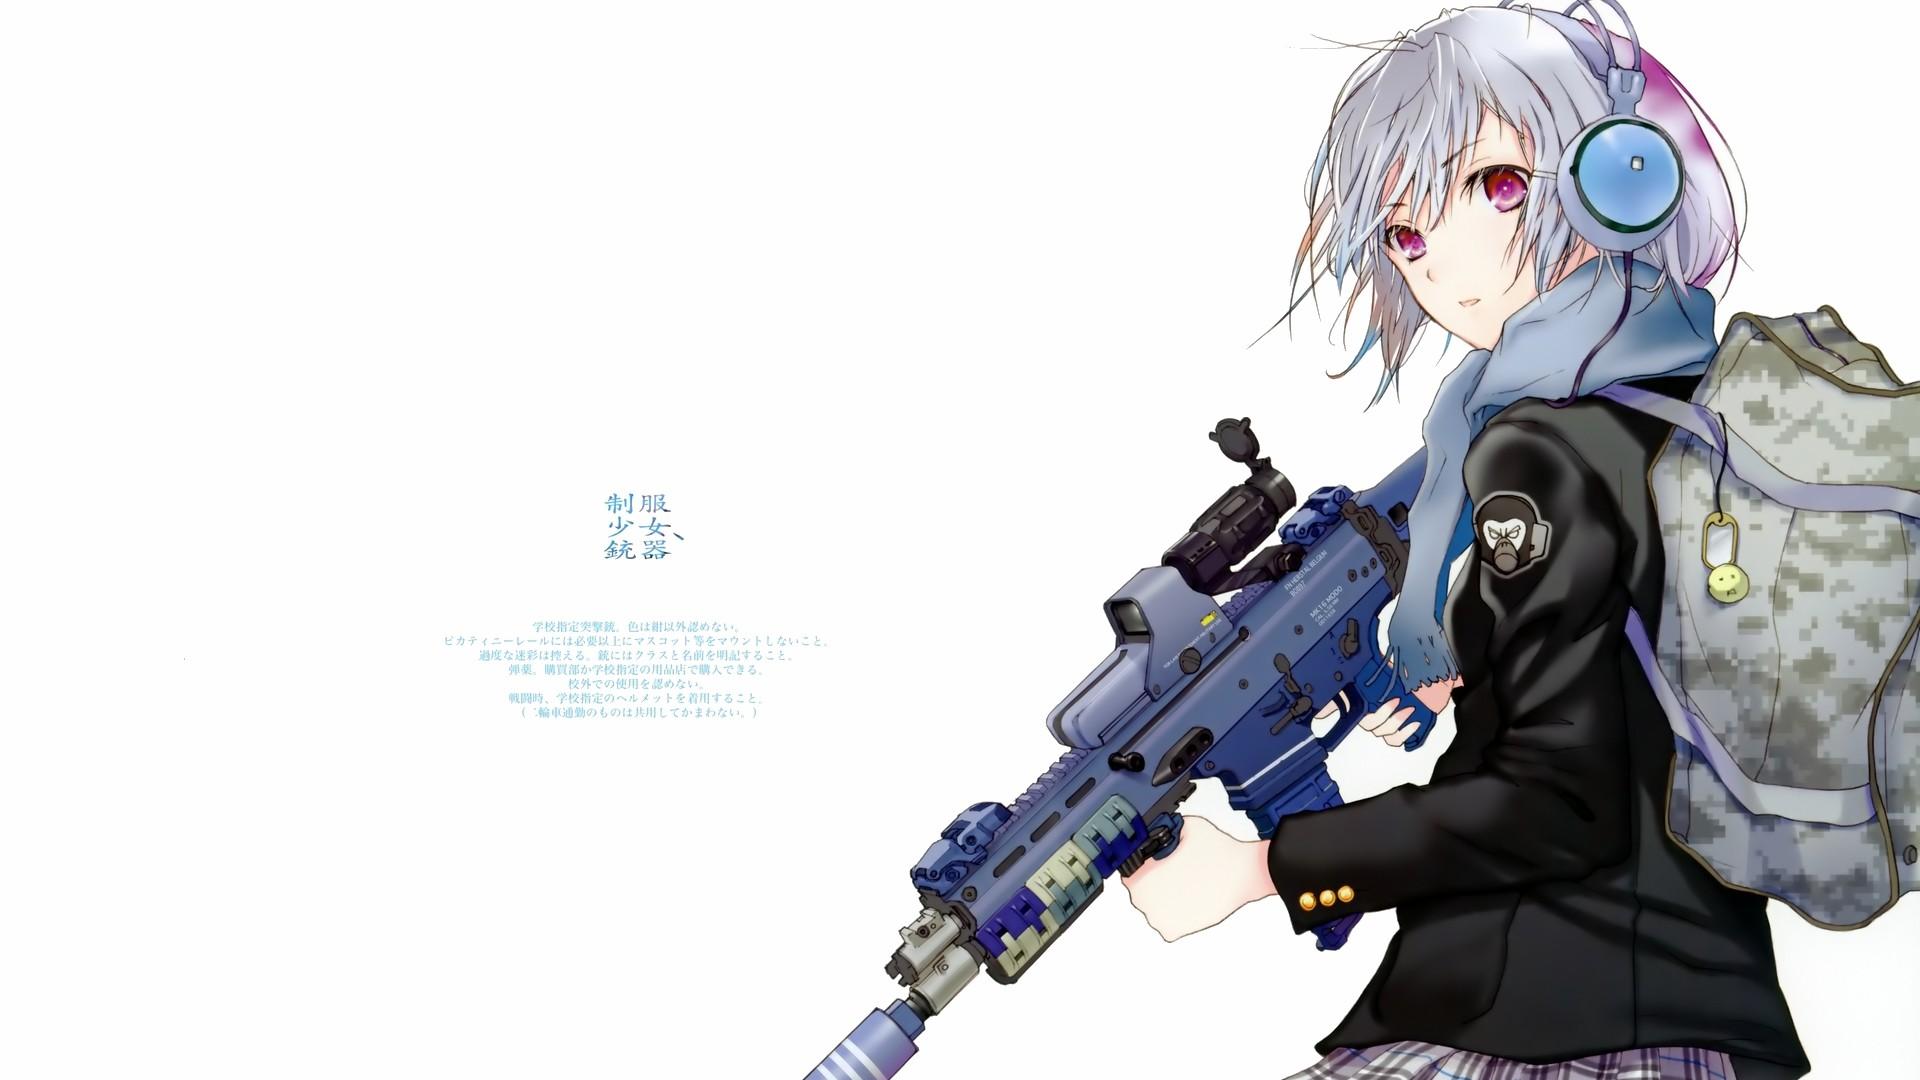 #Anime girls with #guns   anime gun   Pinterest   Anime